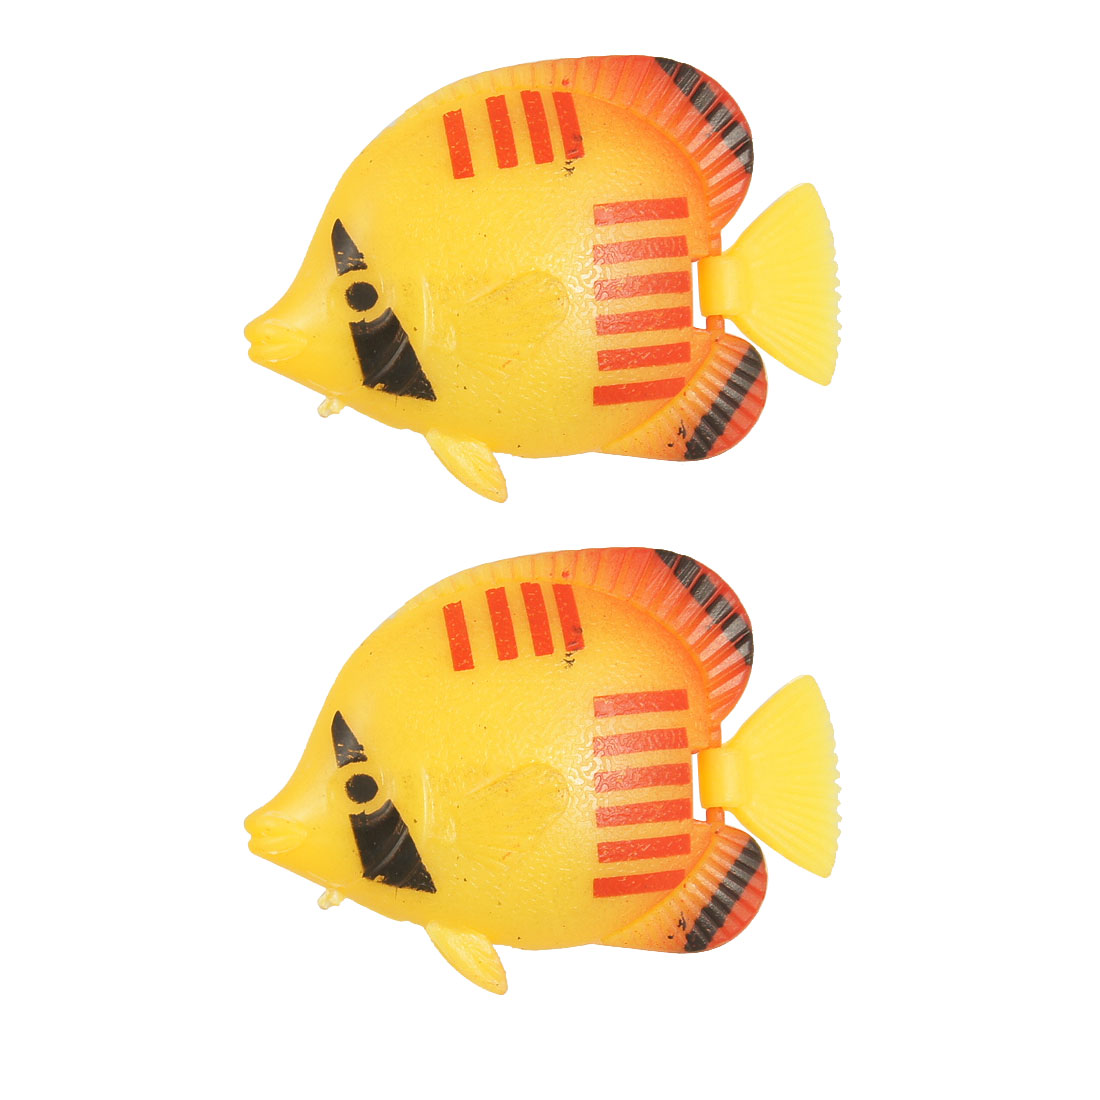 Unique Bargains 2 Pcs Aquarium Water Floating Red Stripe Yellow Fish Ornament